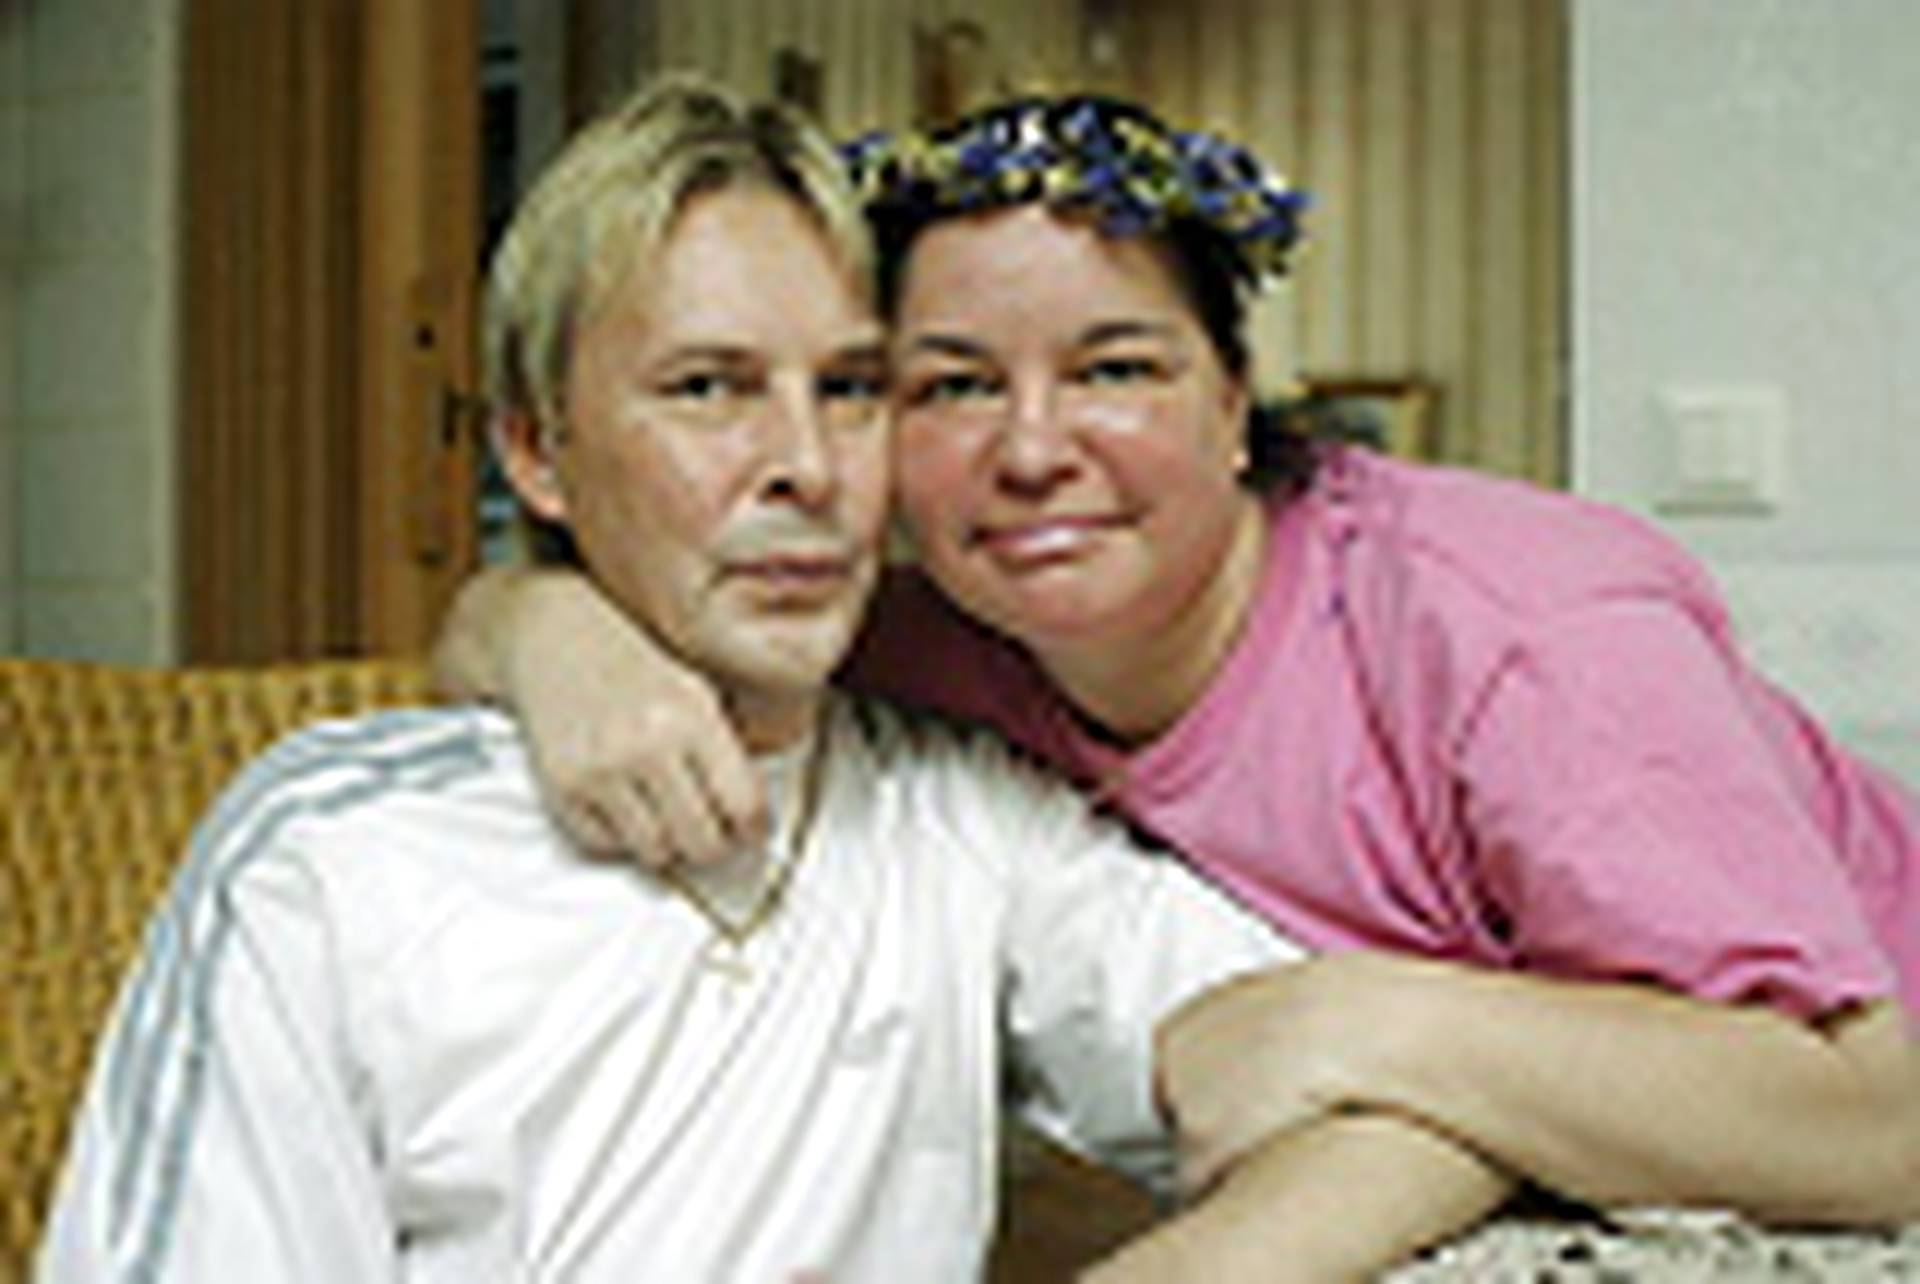 Paras dating site Kaliforniassa